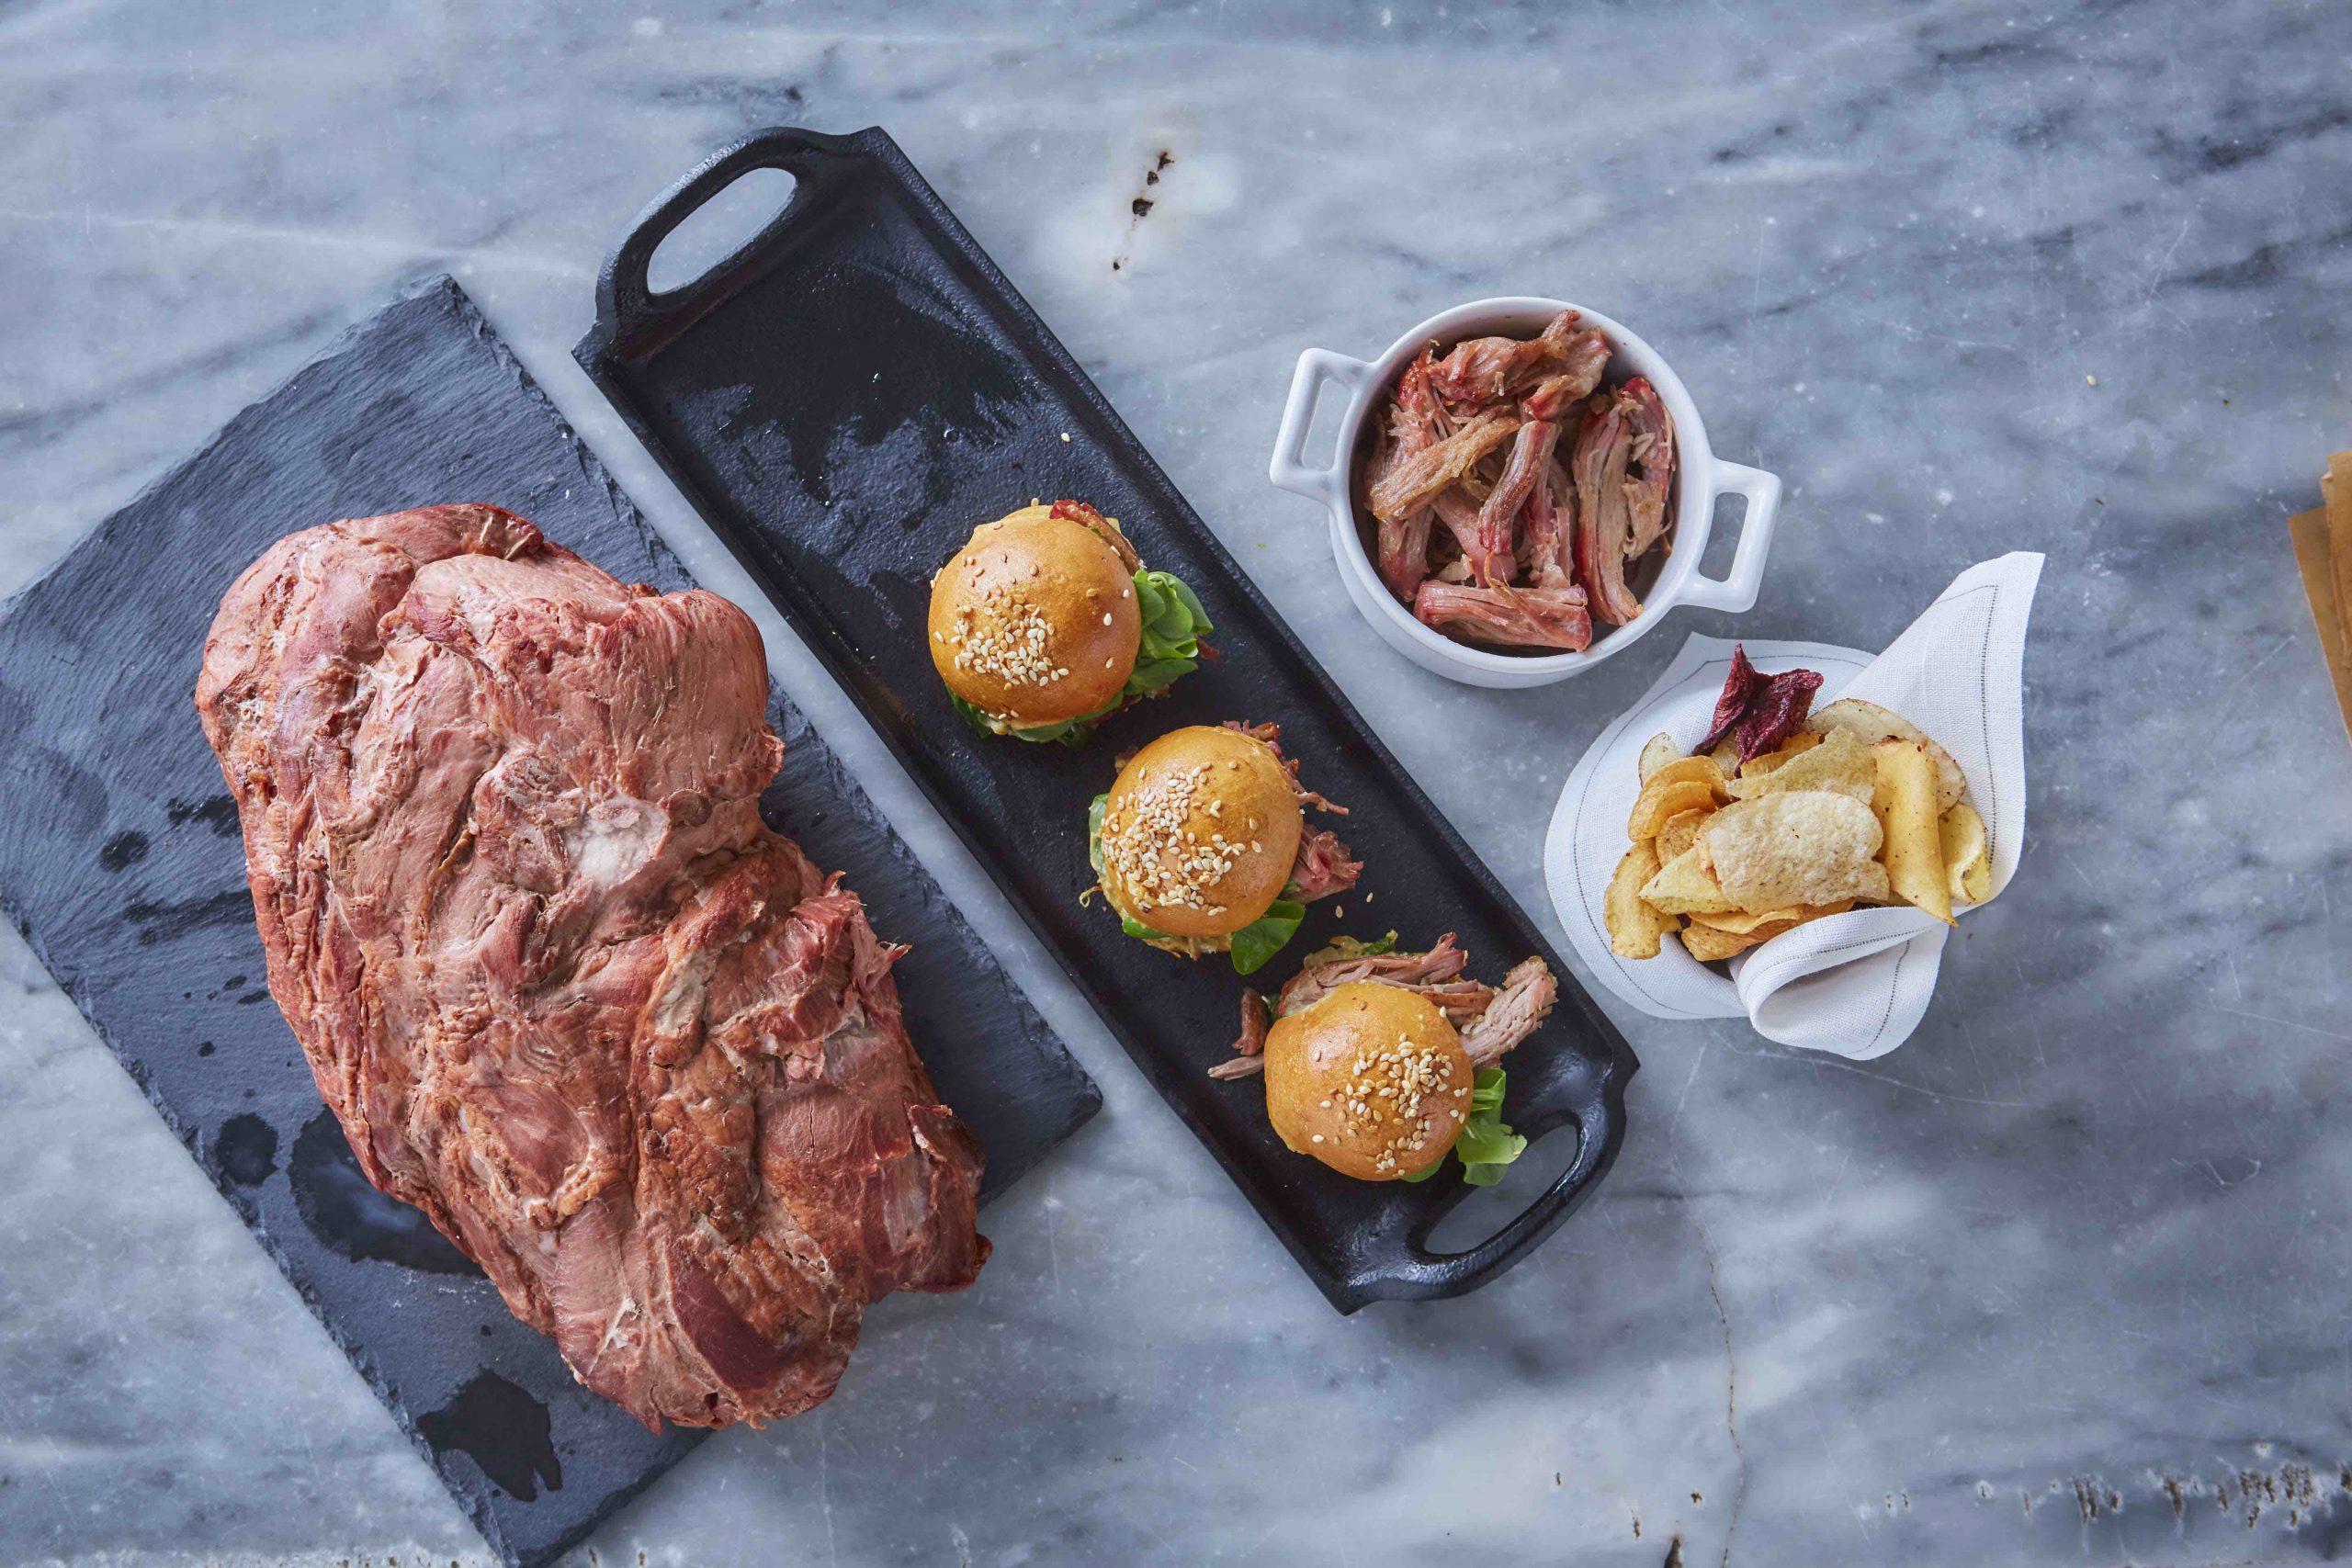 Delicatesse Pulled pork | Prop Styling | Food Photography | E 2.0 Food | www.edizioni20food.com